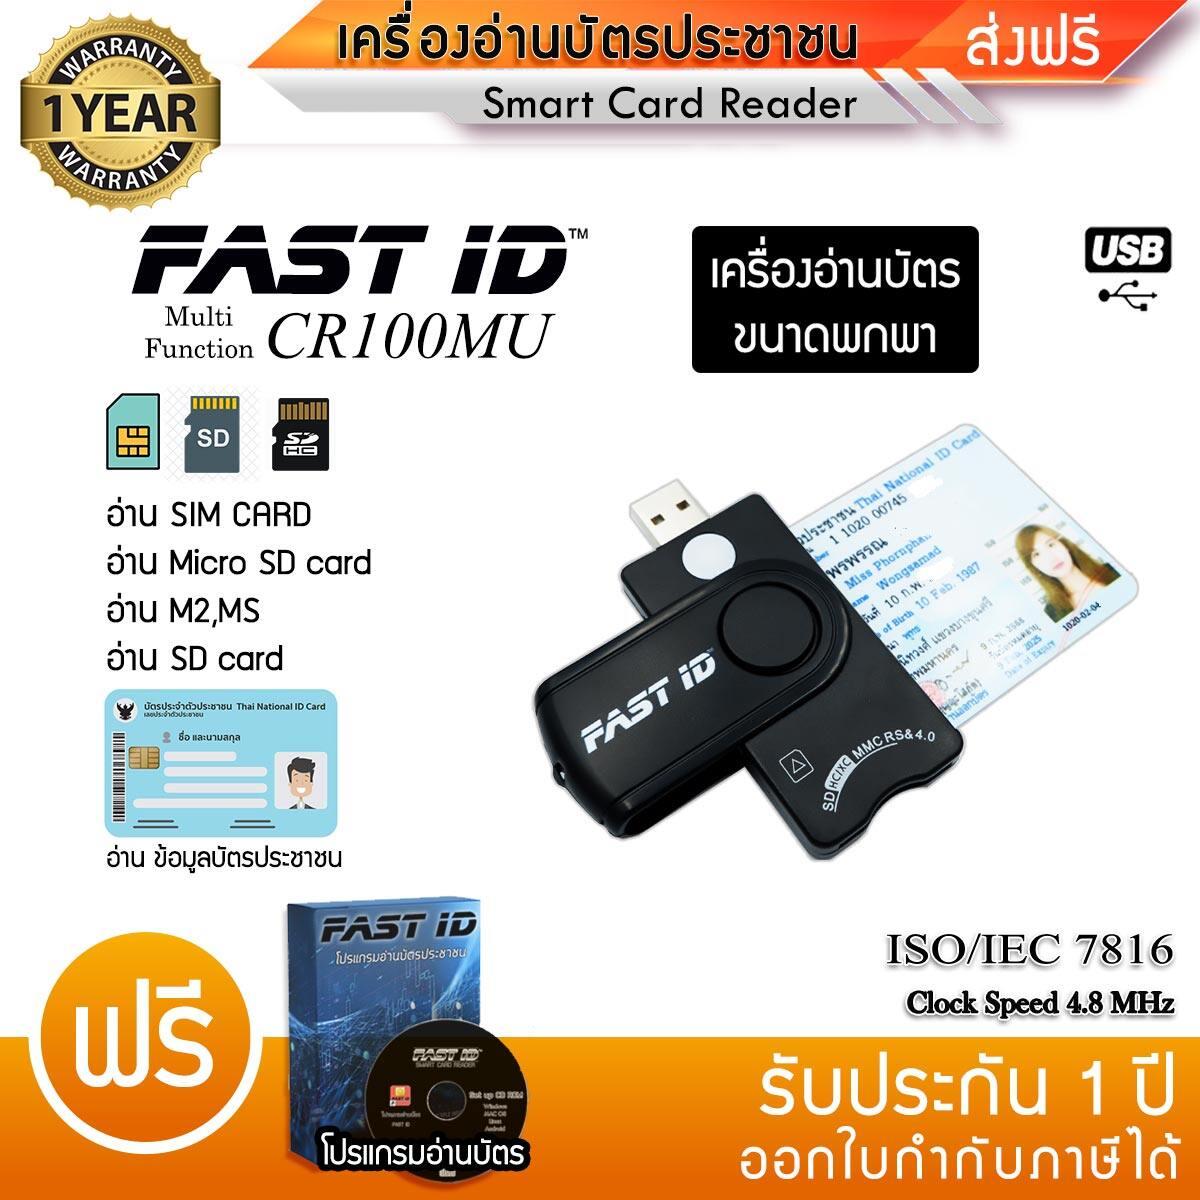 Fast Id เครื่องอ่านบัตรประชาชนขนาดพกพา Usb Card Reader Multi-Disk รุ่น Cr100mu อ่านบัตร มาตรฐานict Smart Card Reader 4.8mhz.